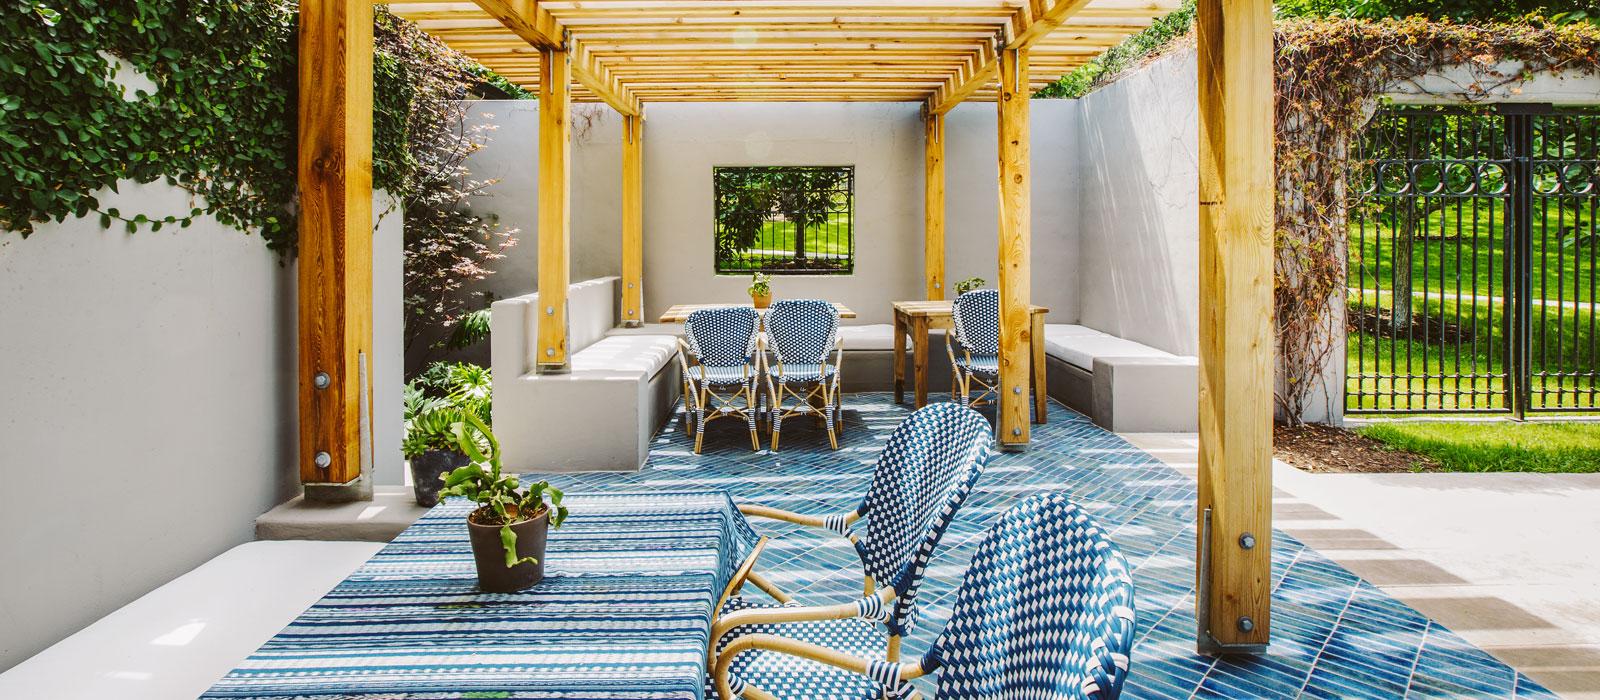 15  poolside bungalow suite Hotel Saint Cecilia Austin Texas interior design vintage apartment ciekawe wnetrza hotelowe styl amerykanski